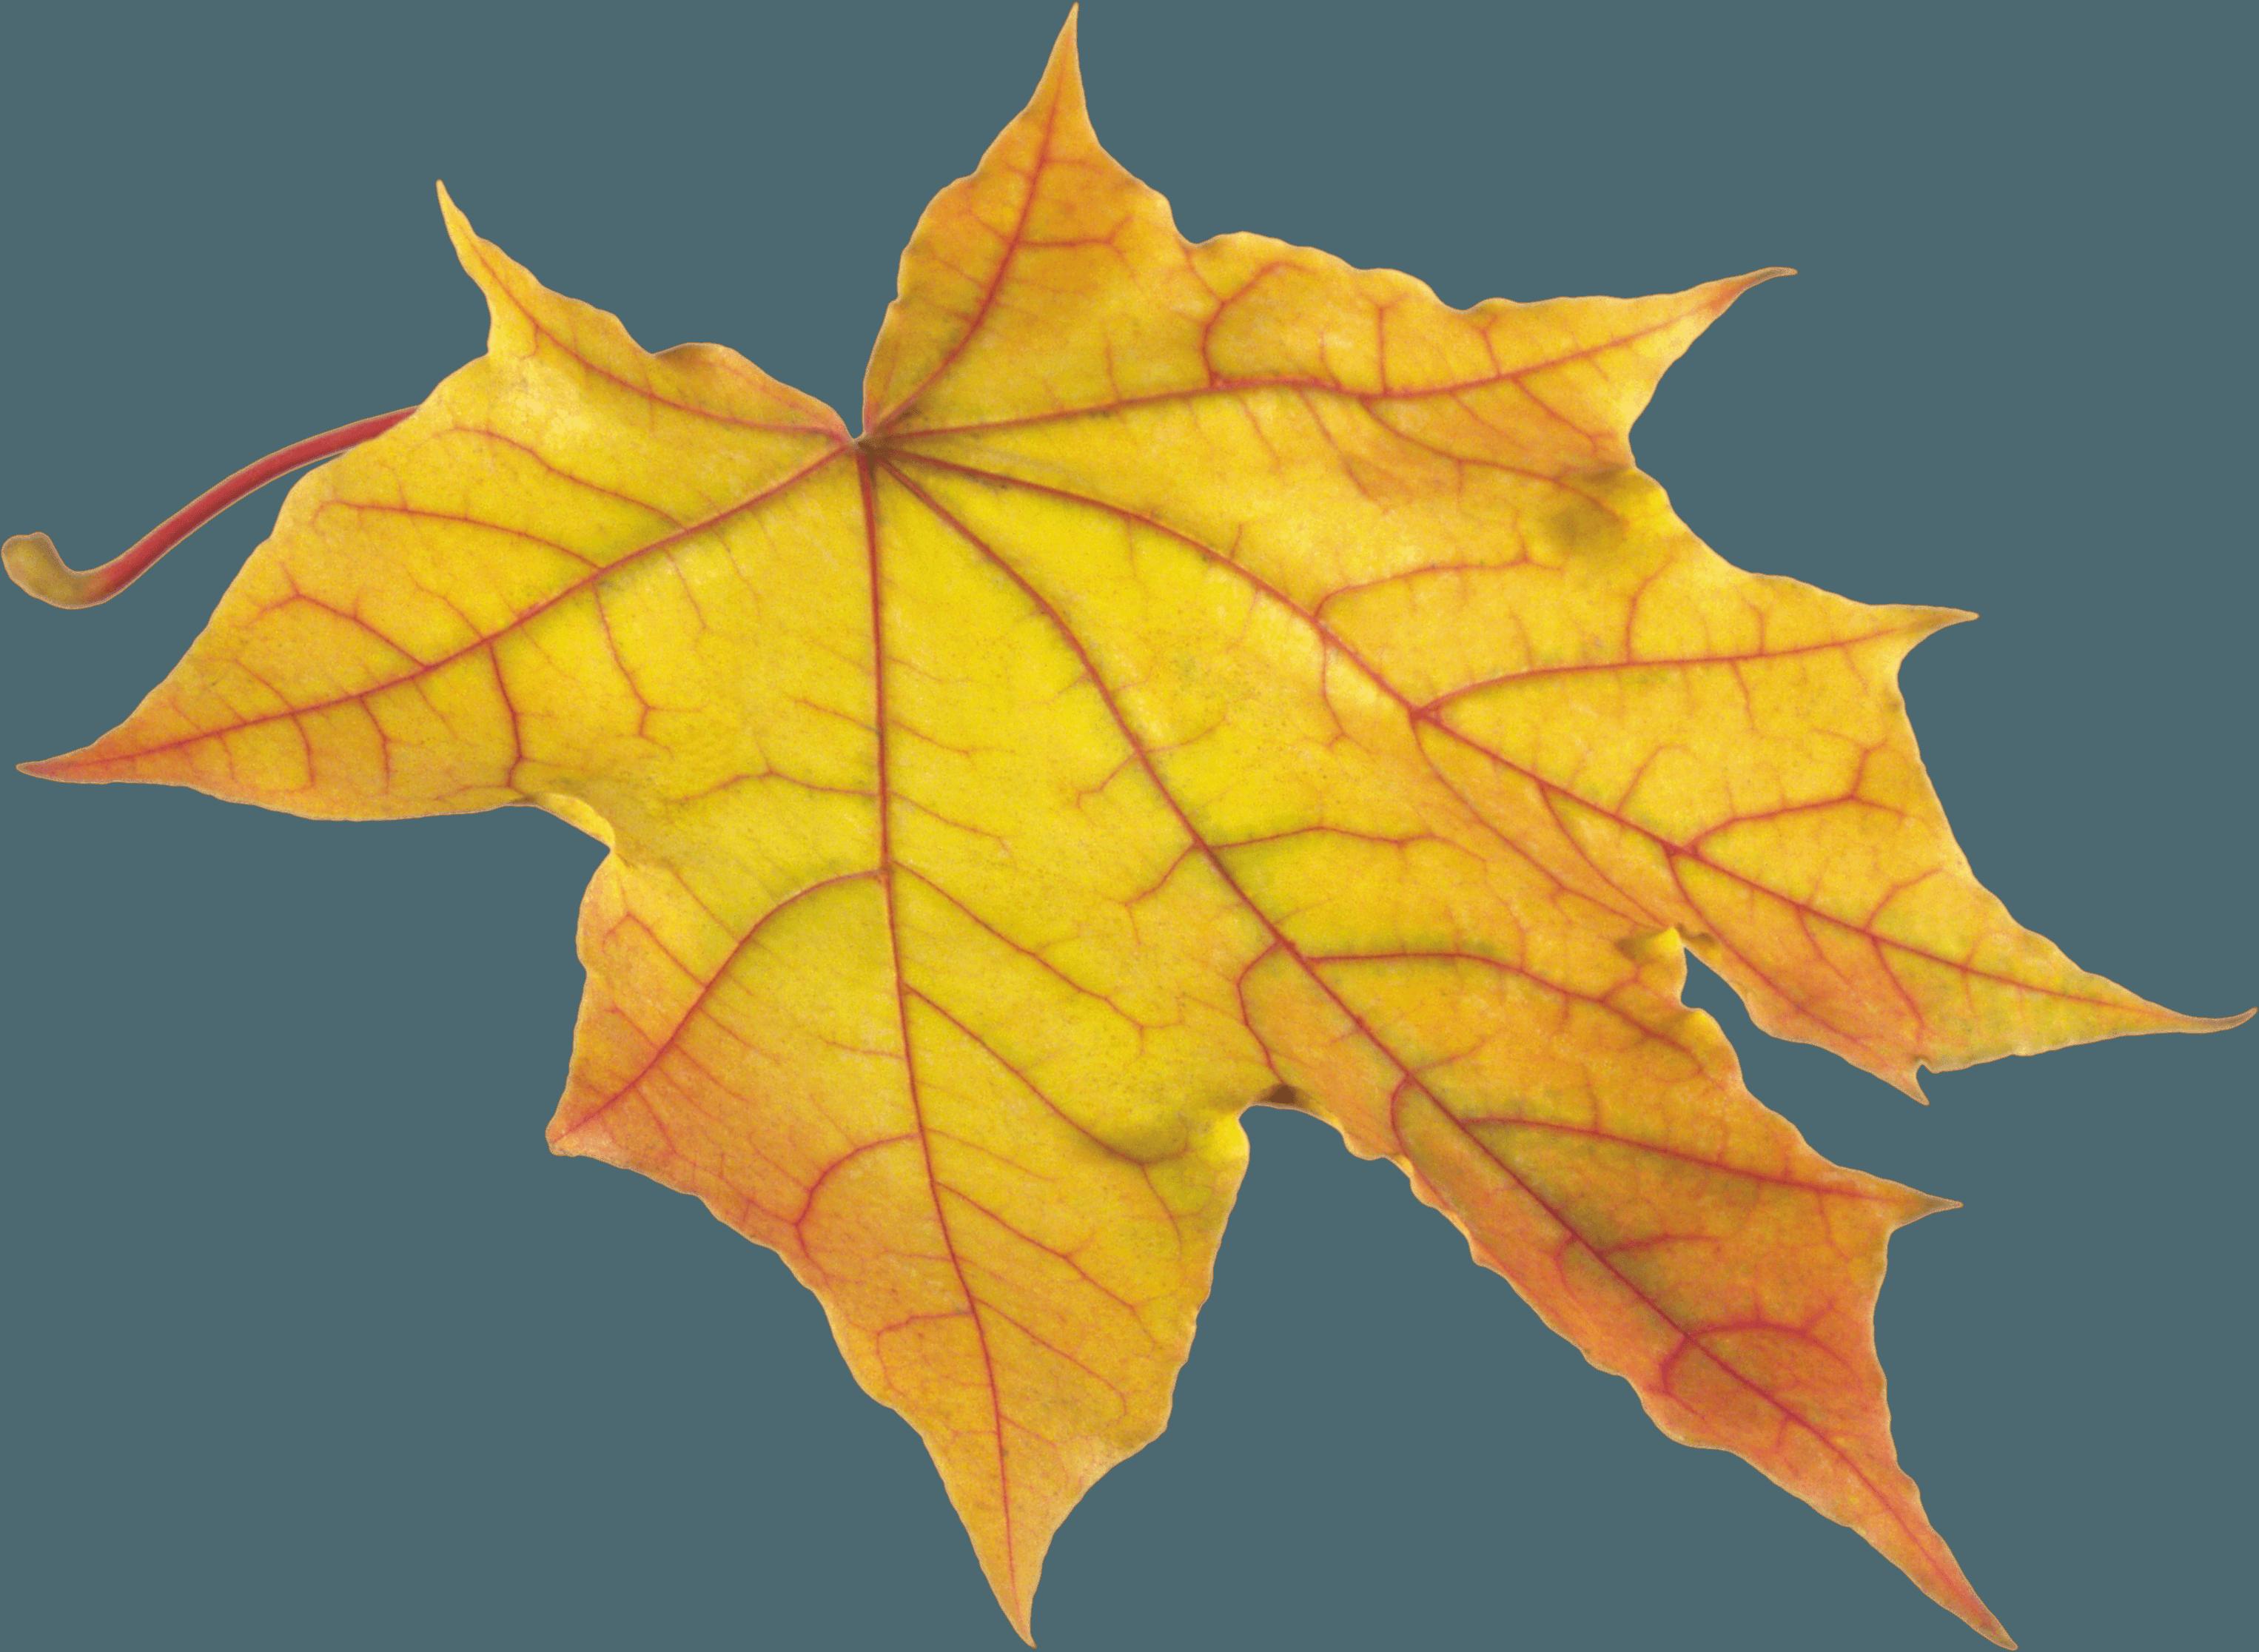 Download Yellow Autumn Png Leaf HQ PNG Image   FreePNGImg